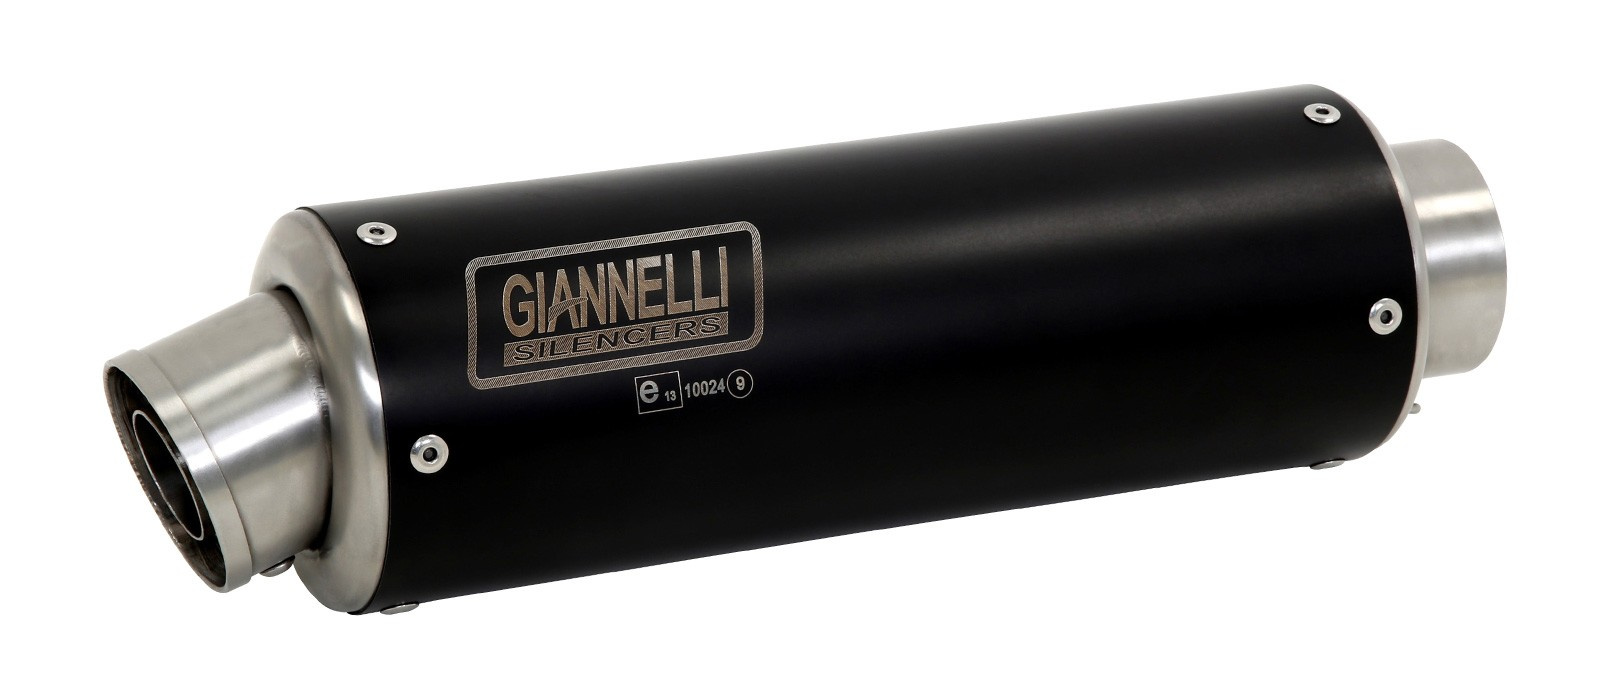 ESCAPES GIANNELLI HONDA - Sistema completo nicrom black X-PRO Honda SW-T 600 Giannelli 73575XP -